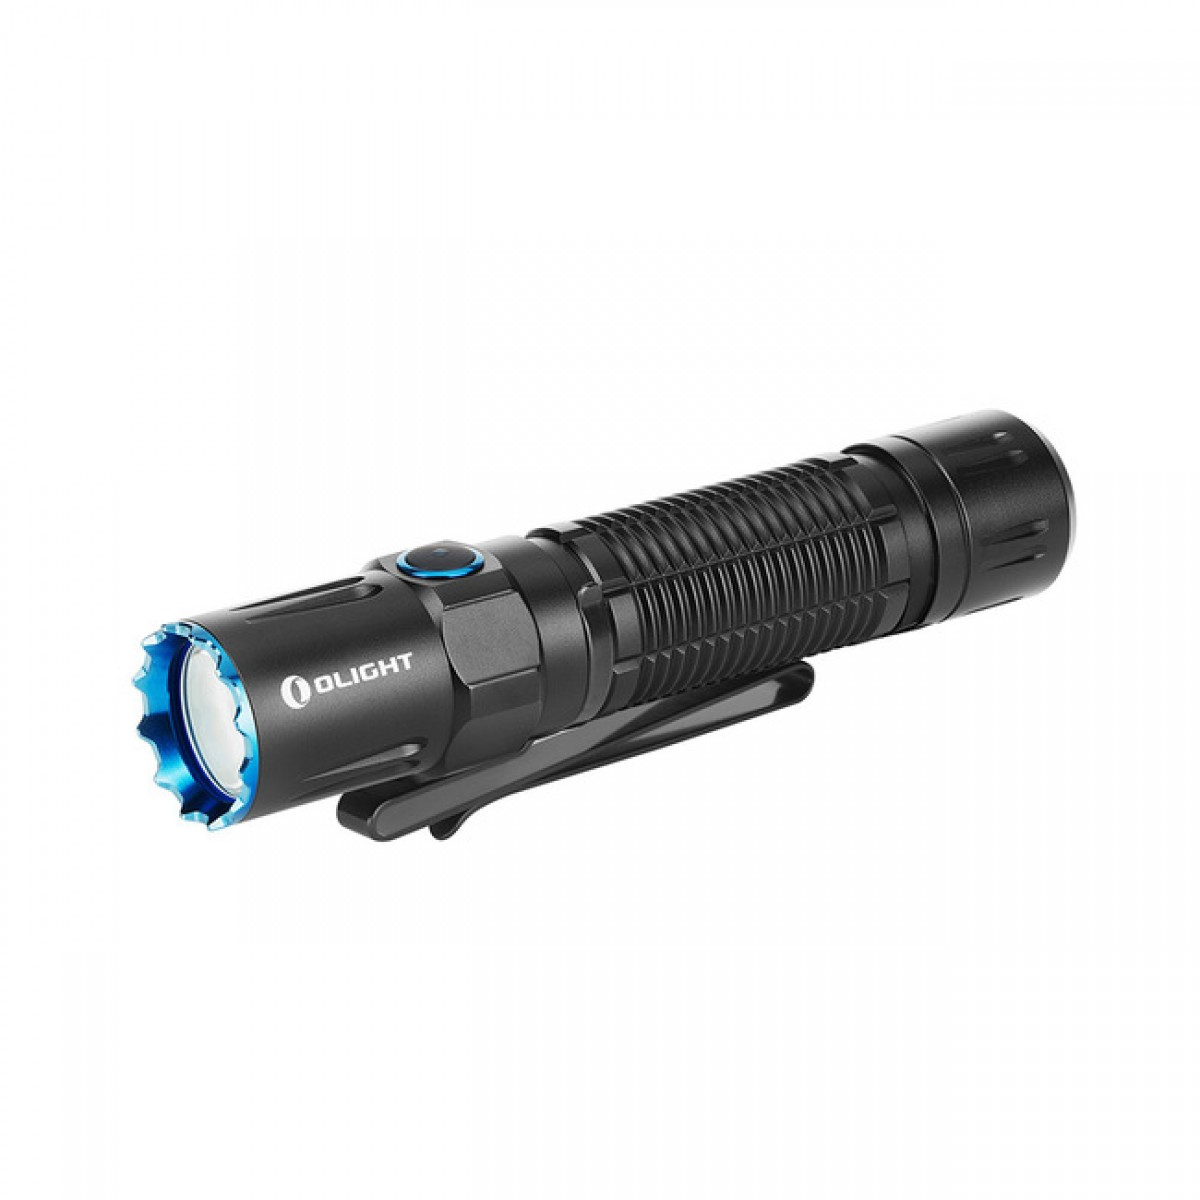 Olight M2R Pro Warrior LED 1800L Rechargeable Flashlight Black